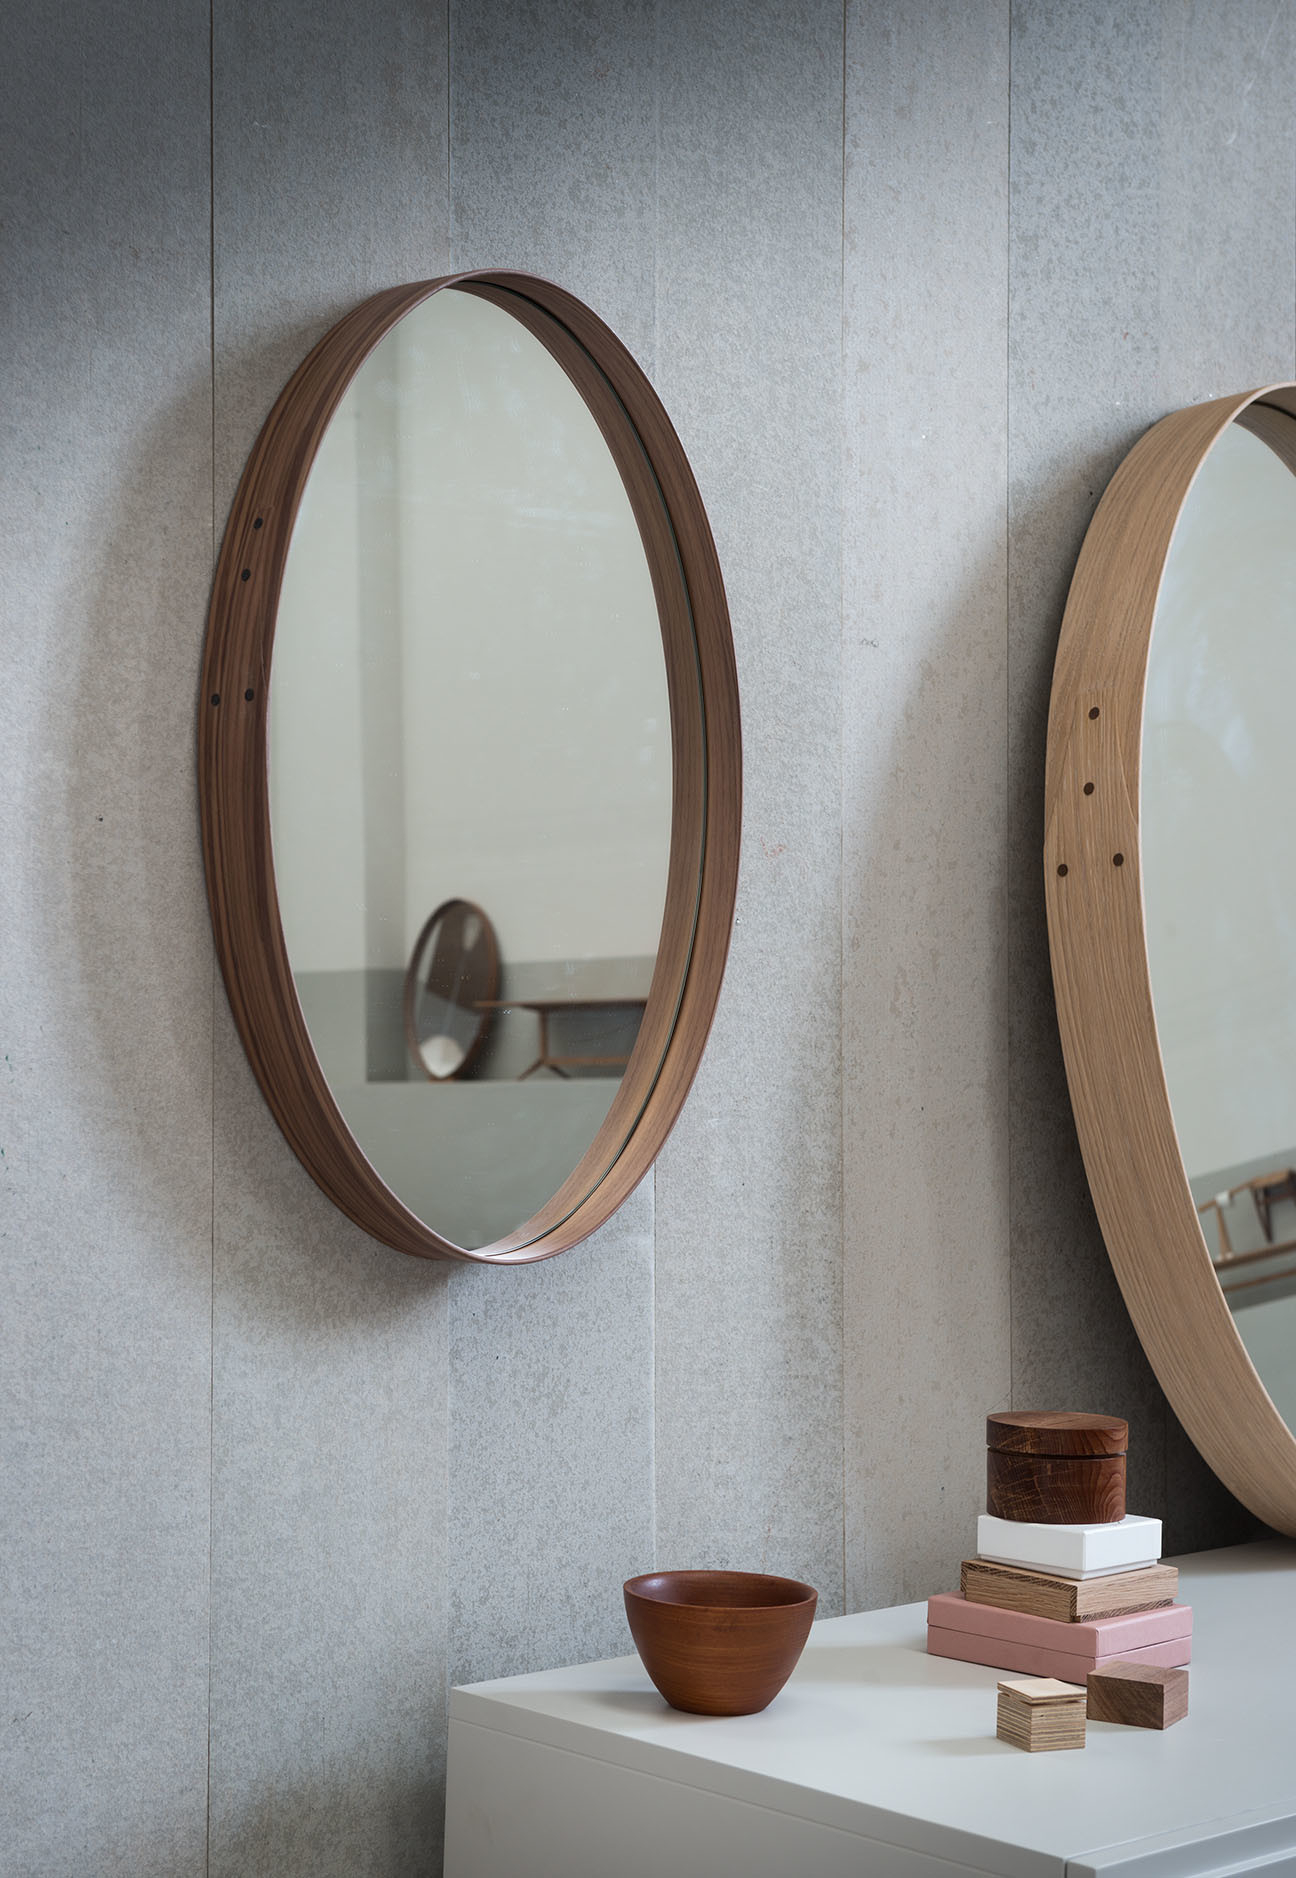 2019 Iona Wall Hung Mirror Small With Hang Wall Mirrors (Gallery 3 of 20)